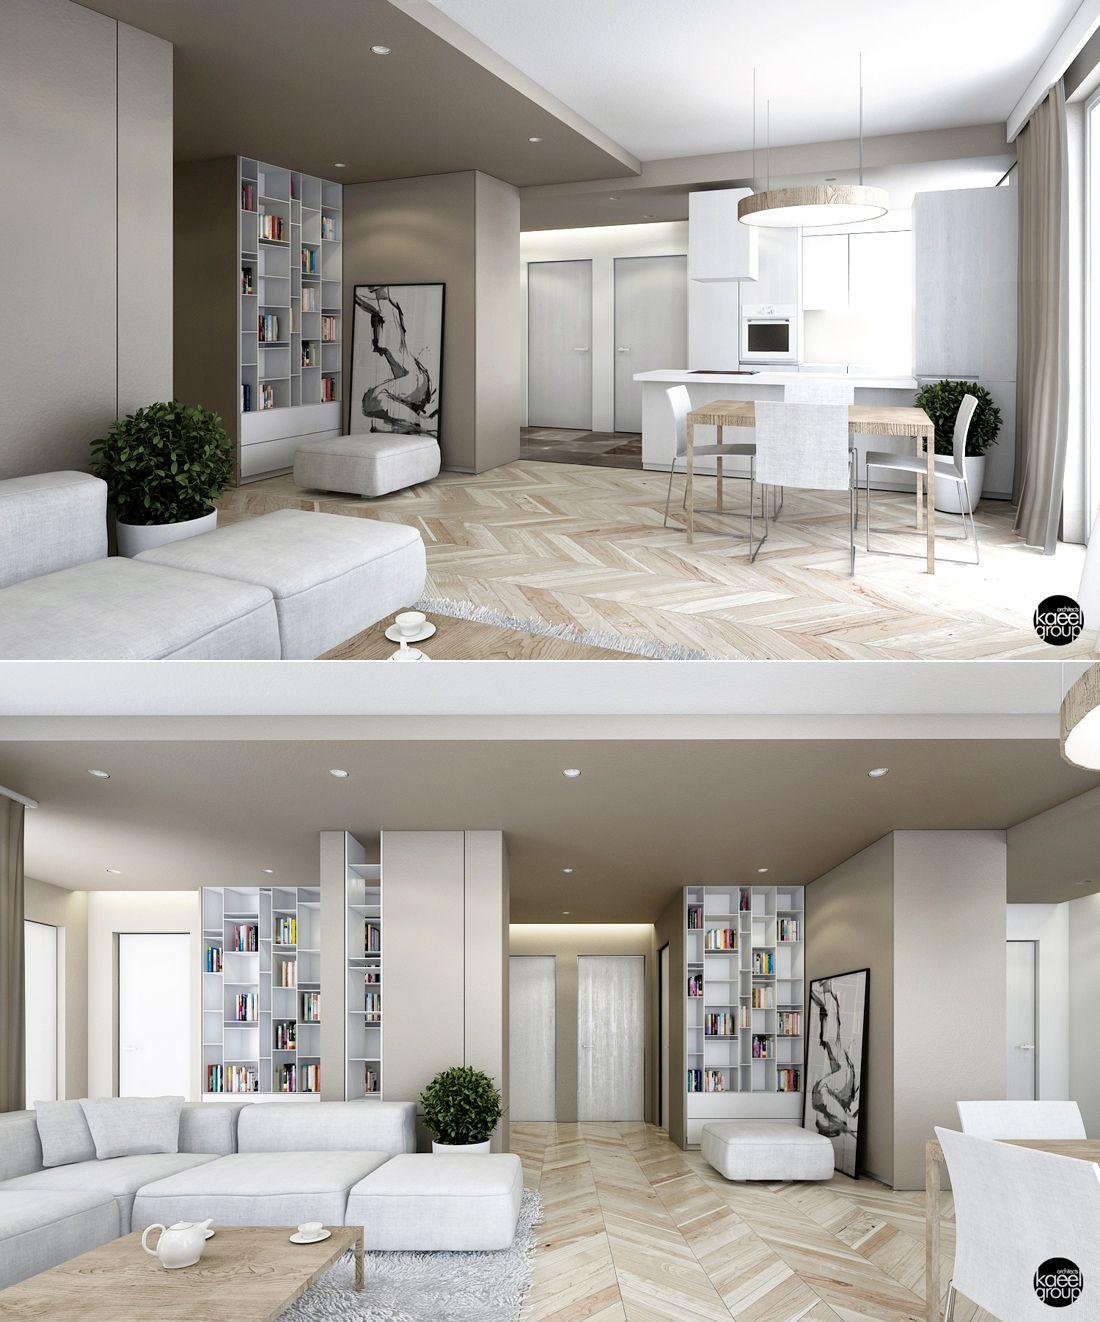 23 Open Concept Apartment Interiors For Inspiration Architecture Design Apartment Interior Open Plan Living Room House Design